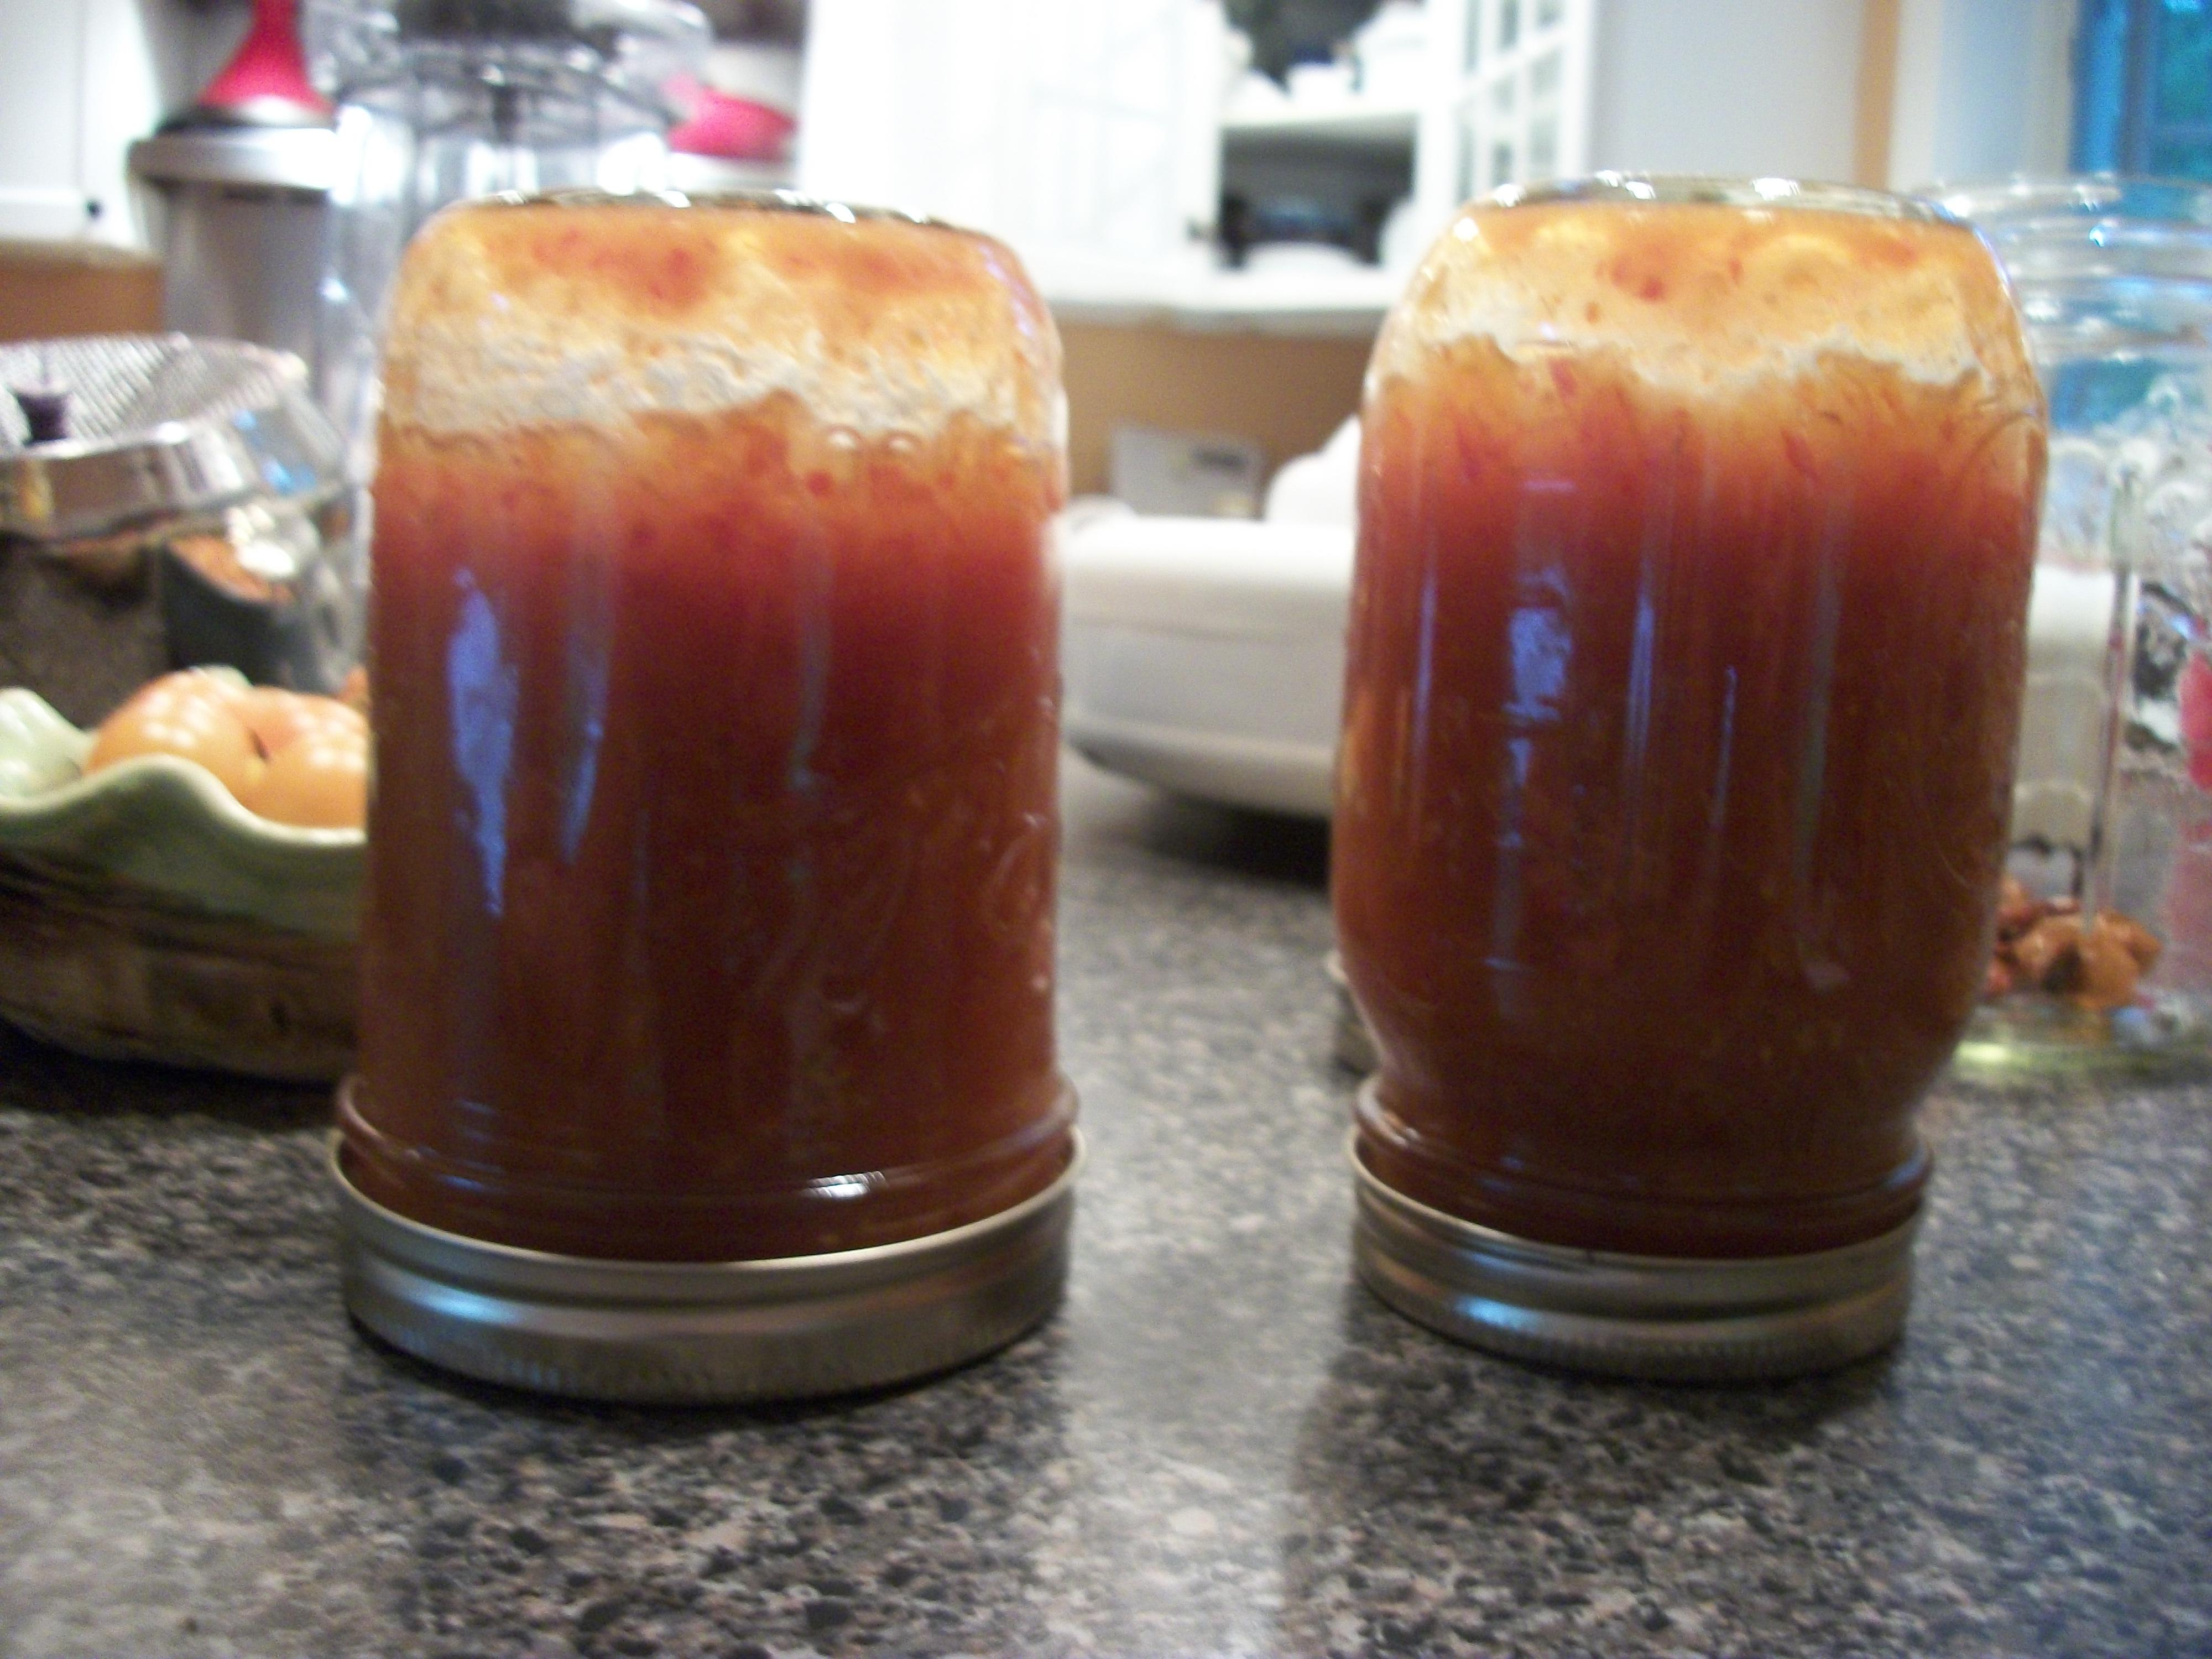 Rose Hip Jelly/Jam to taste like. I had imagined a clearer jelly ...